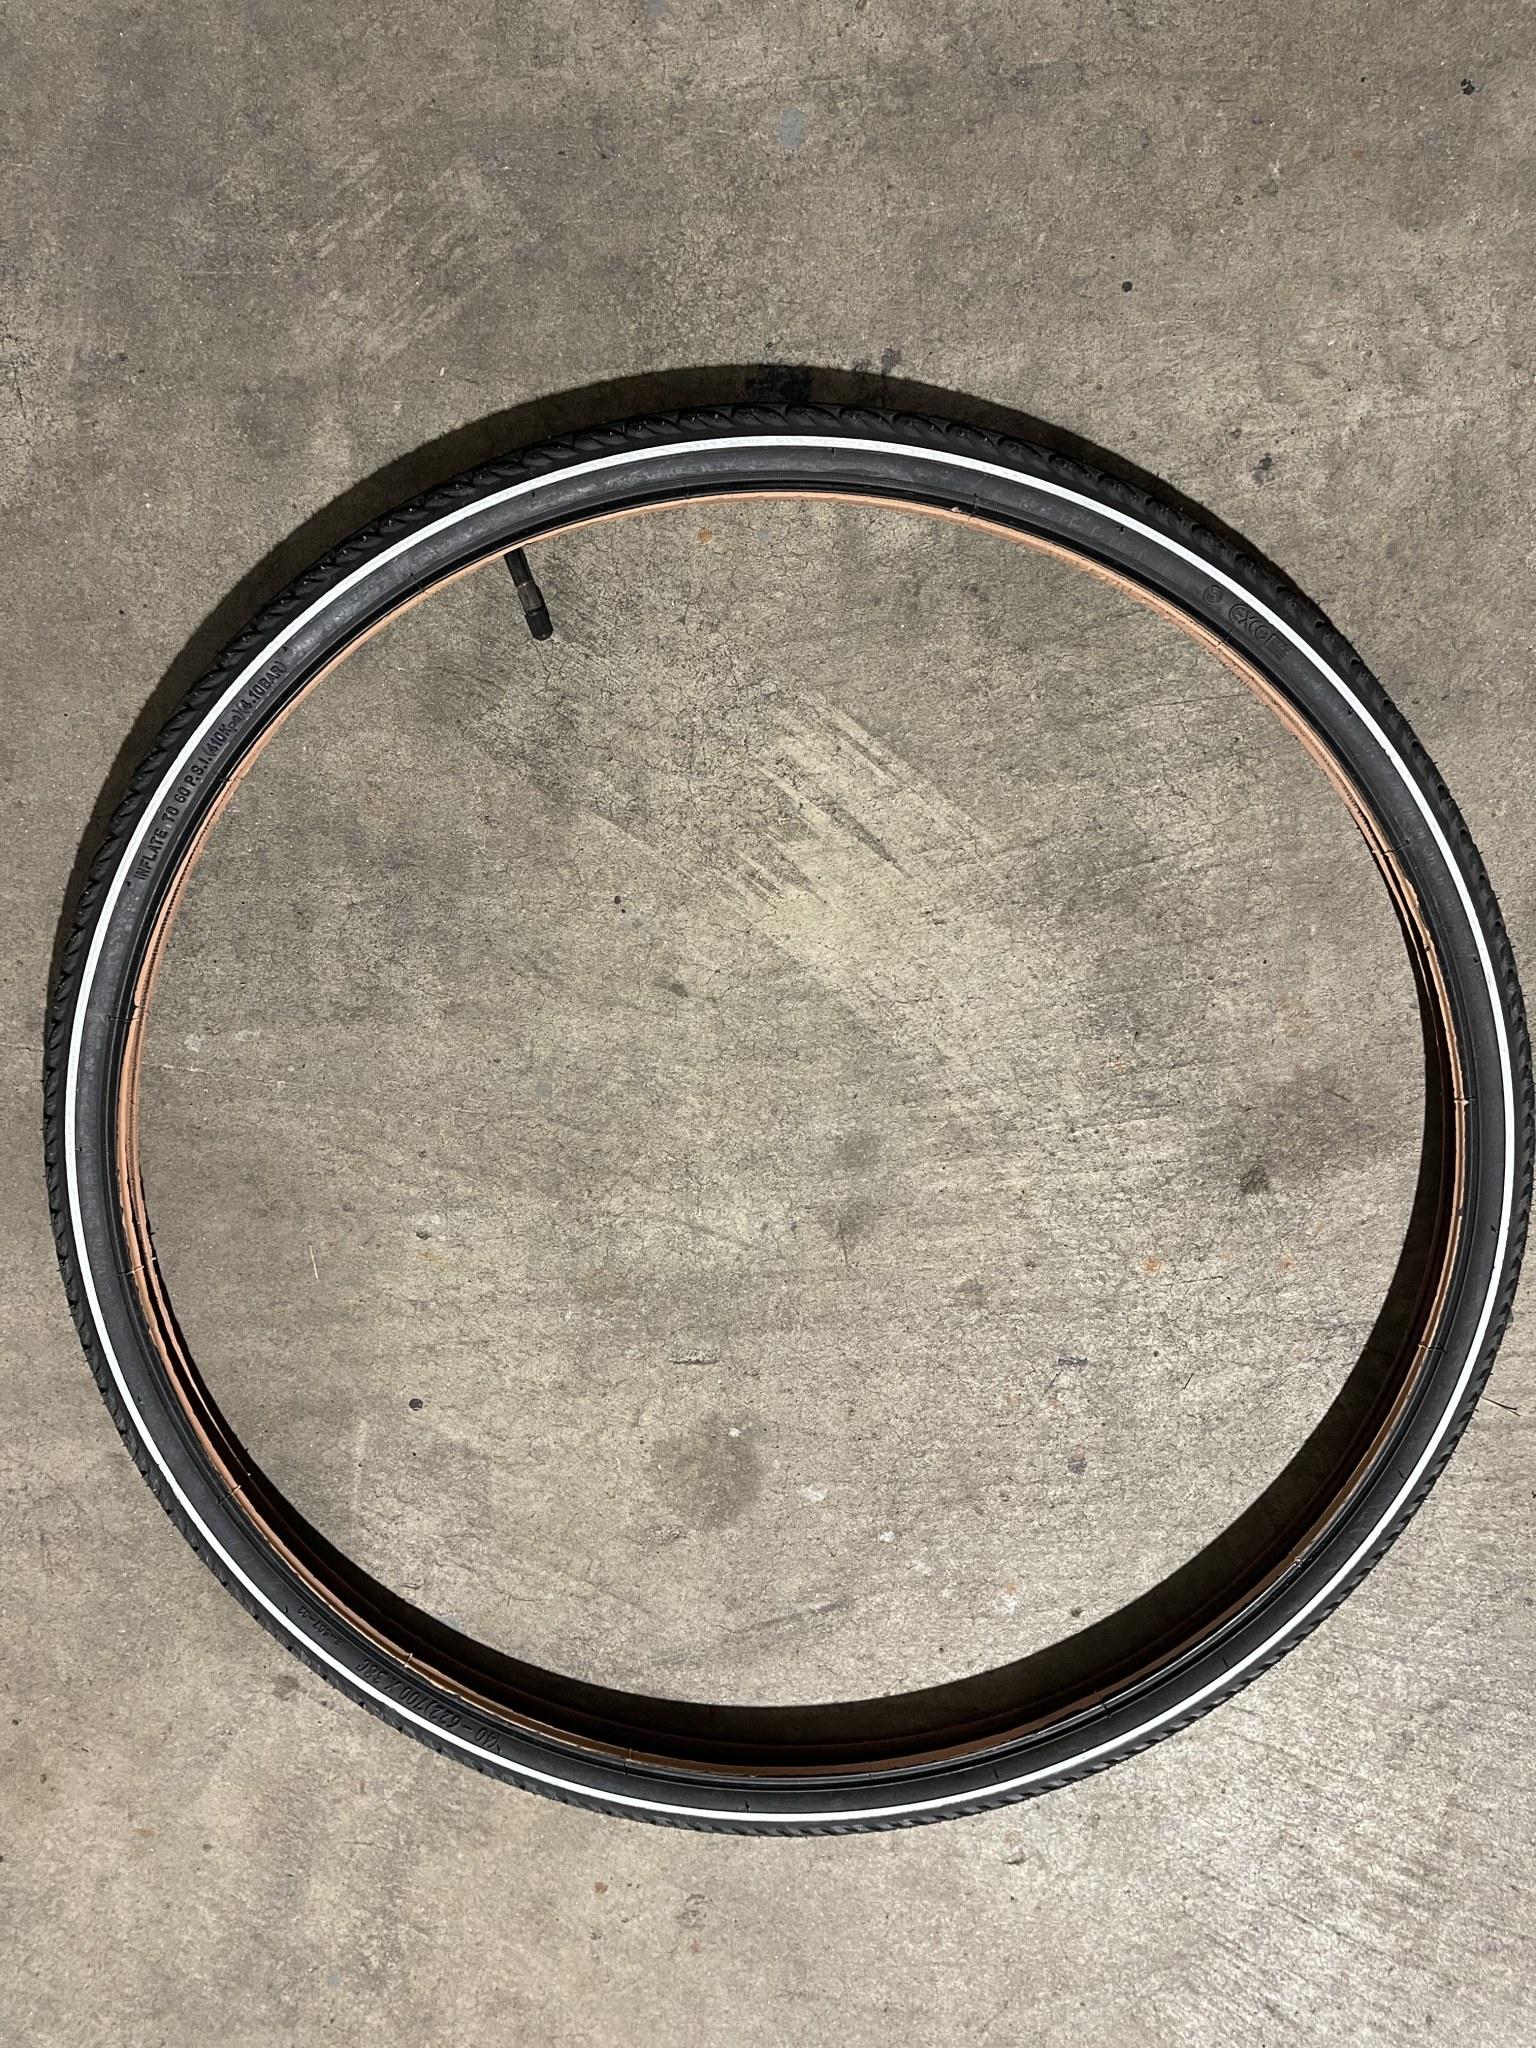 Bulk 700 X 38 Black Tire & Tube